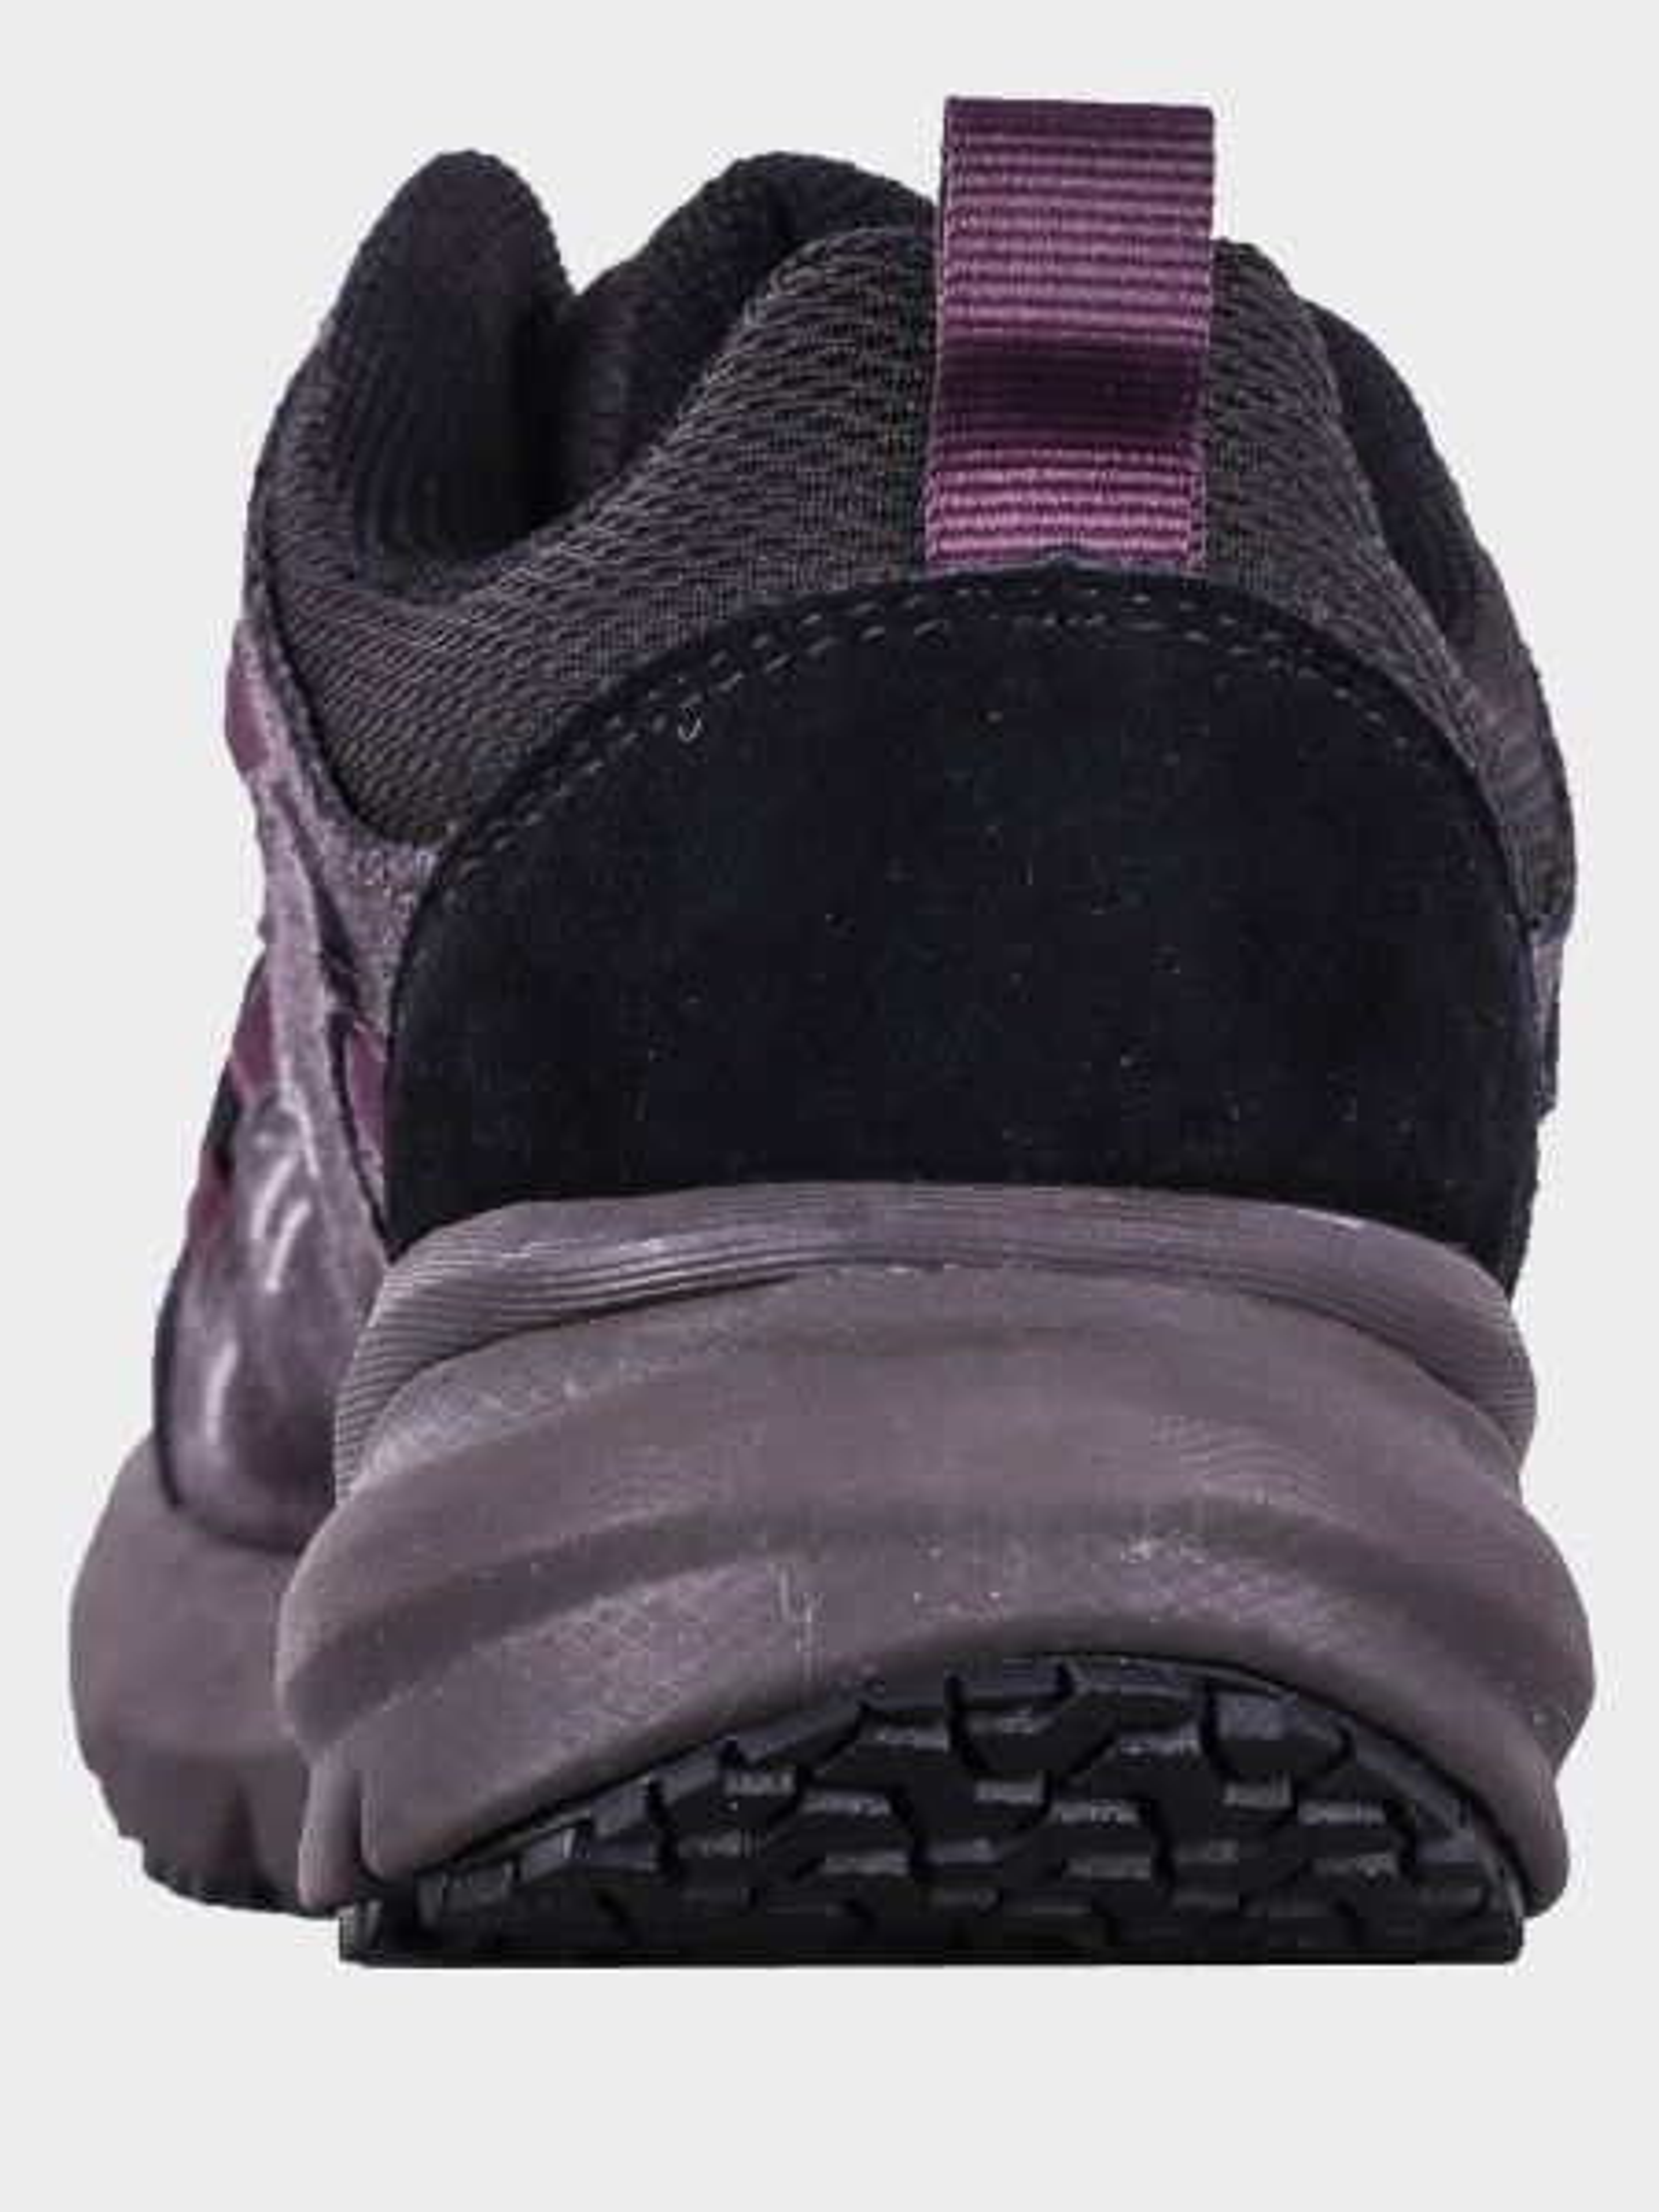 Кросівки  для жінок The North Face Mountain Sneaker II NF0A3WZ9H351 купити в Україні, 2017